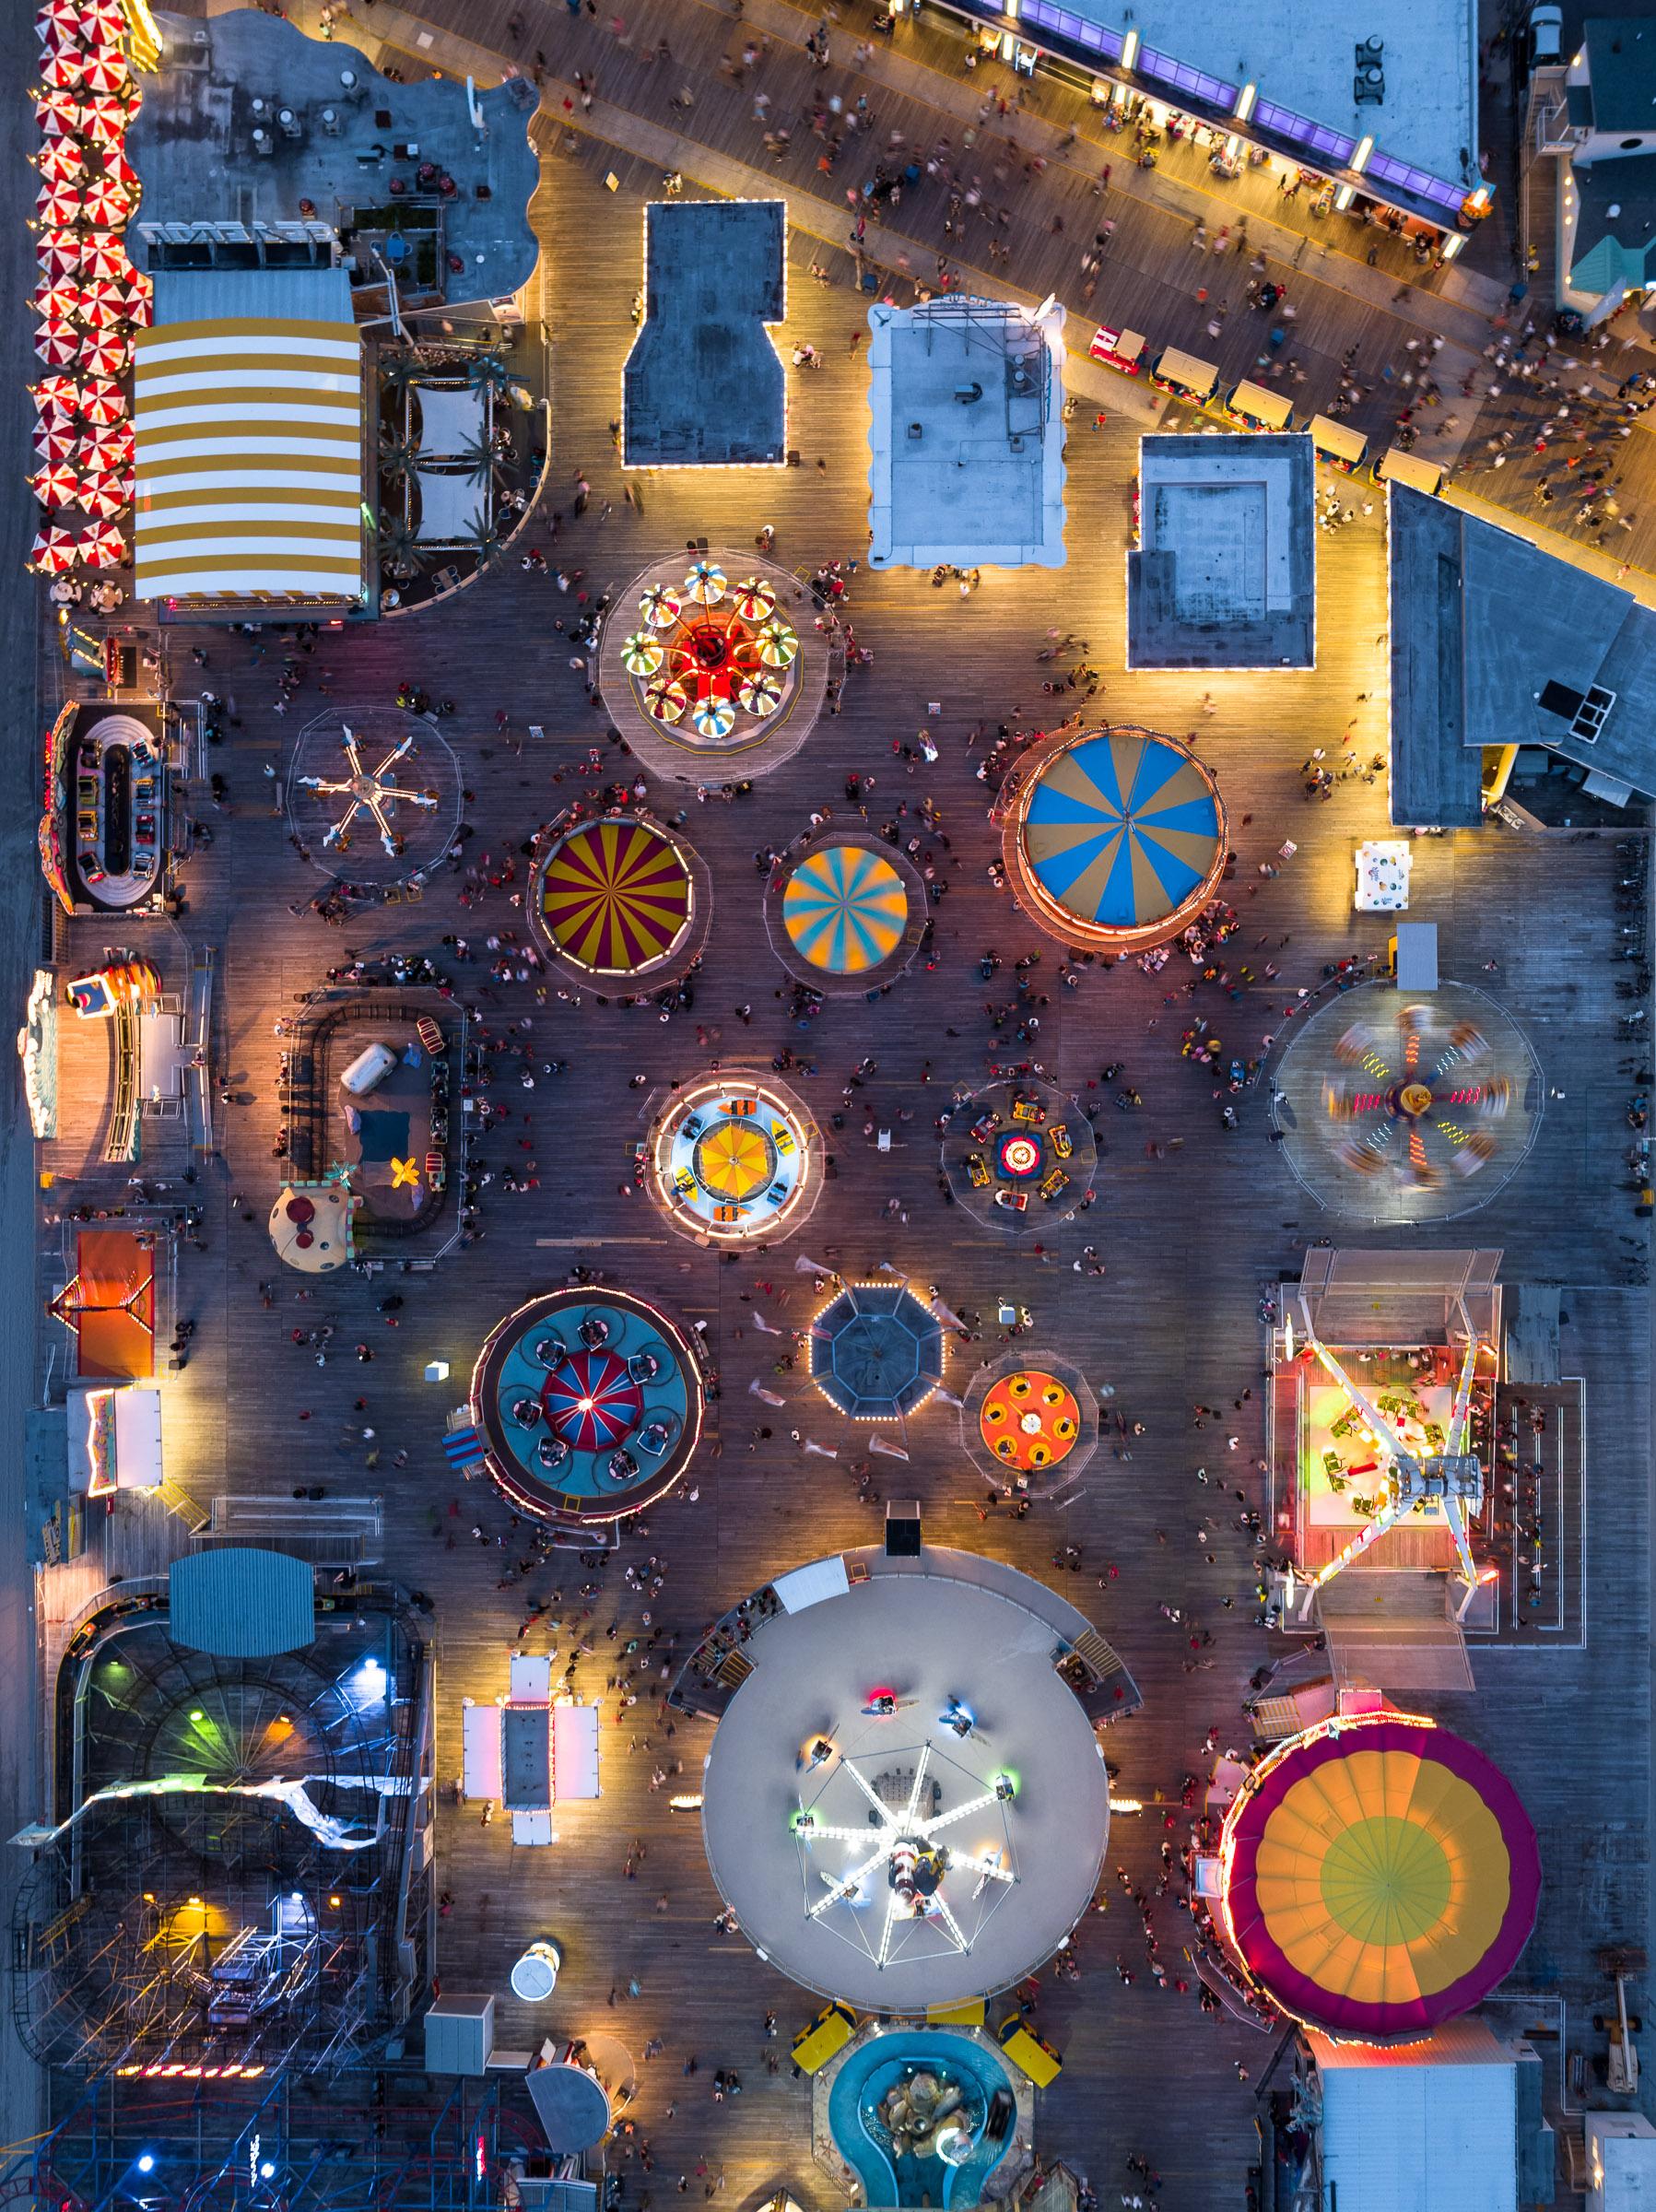 playgames_typoland_aerial-1.jpg